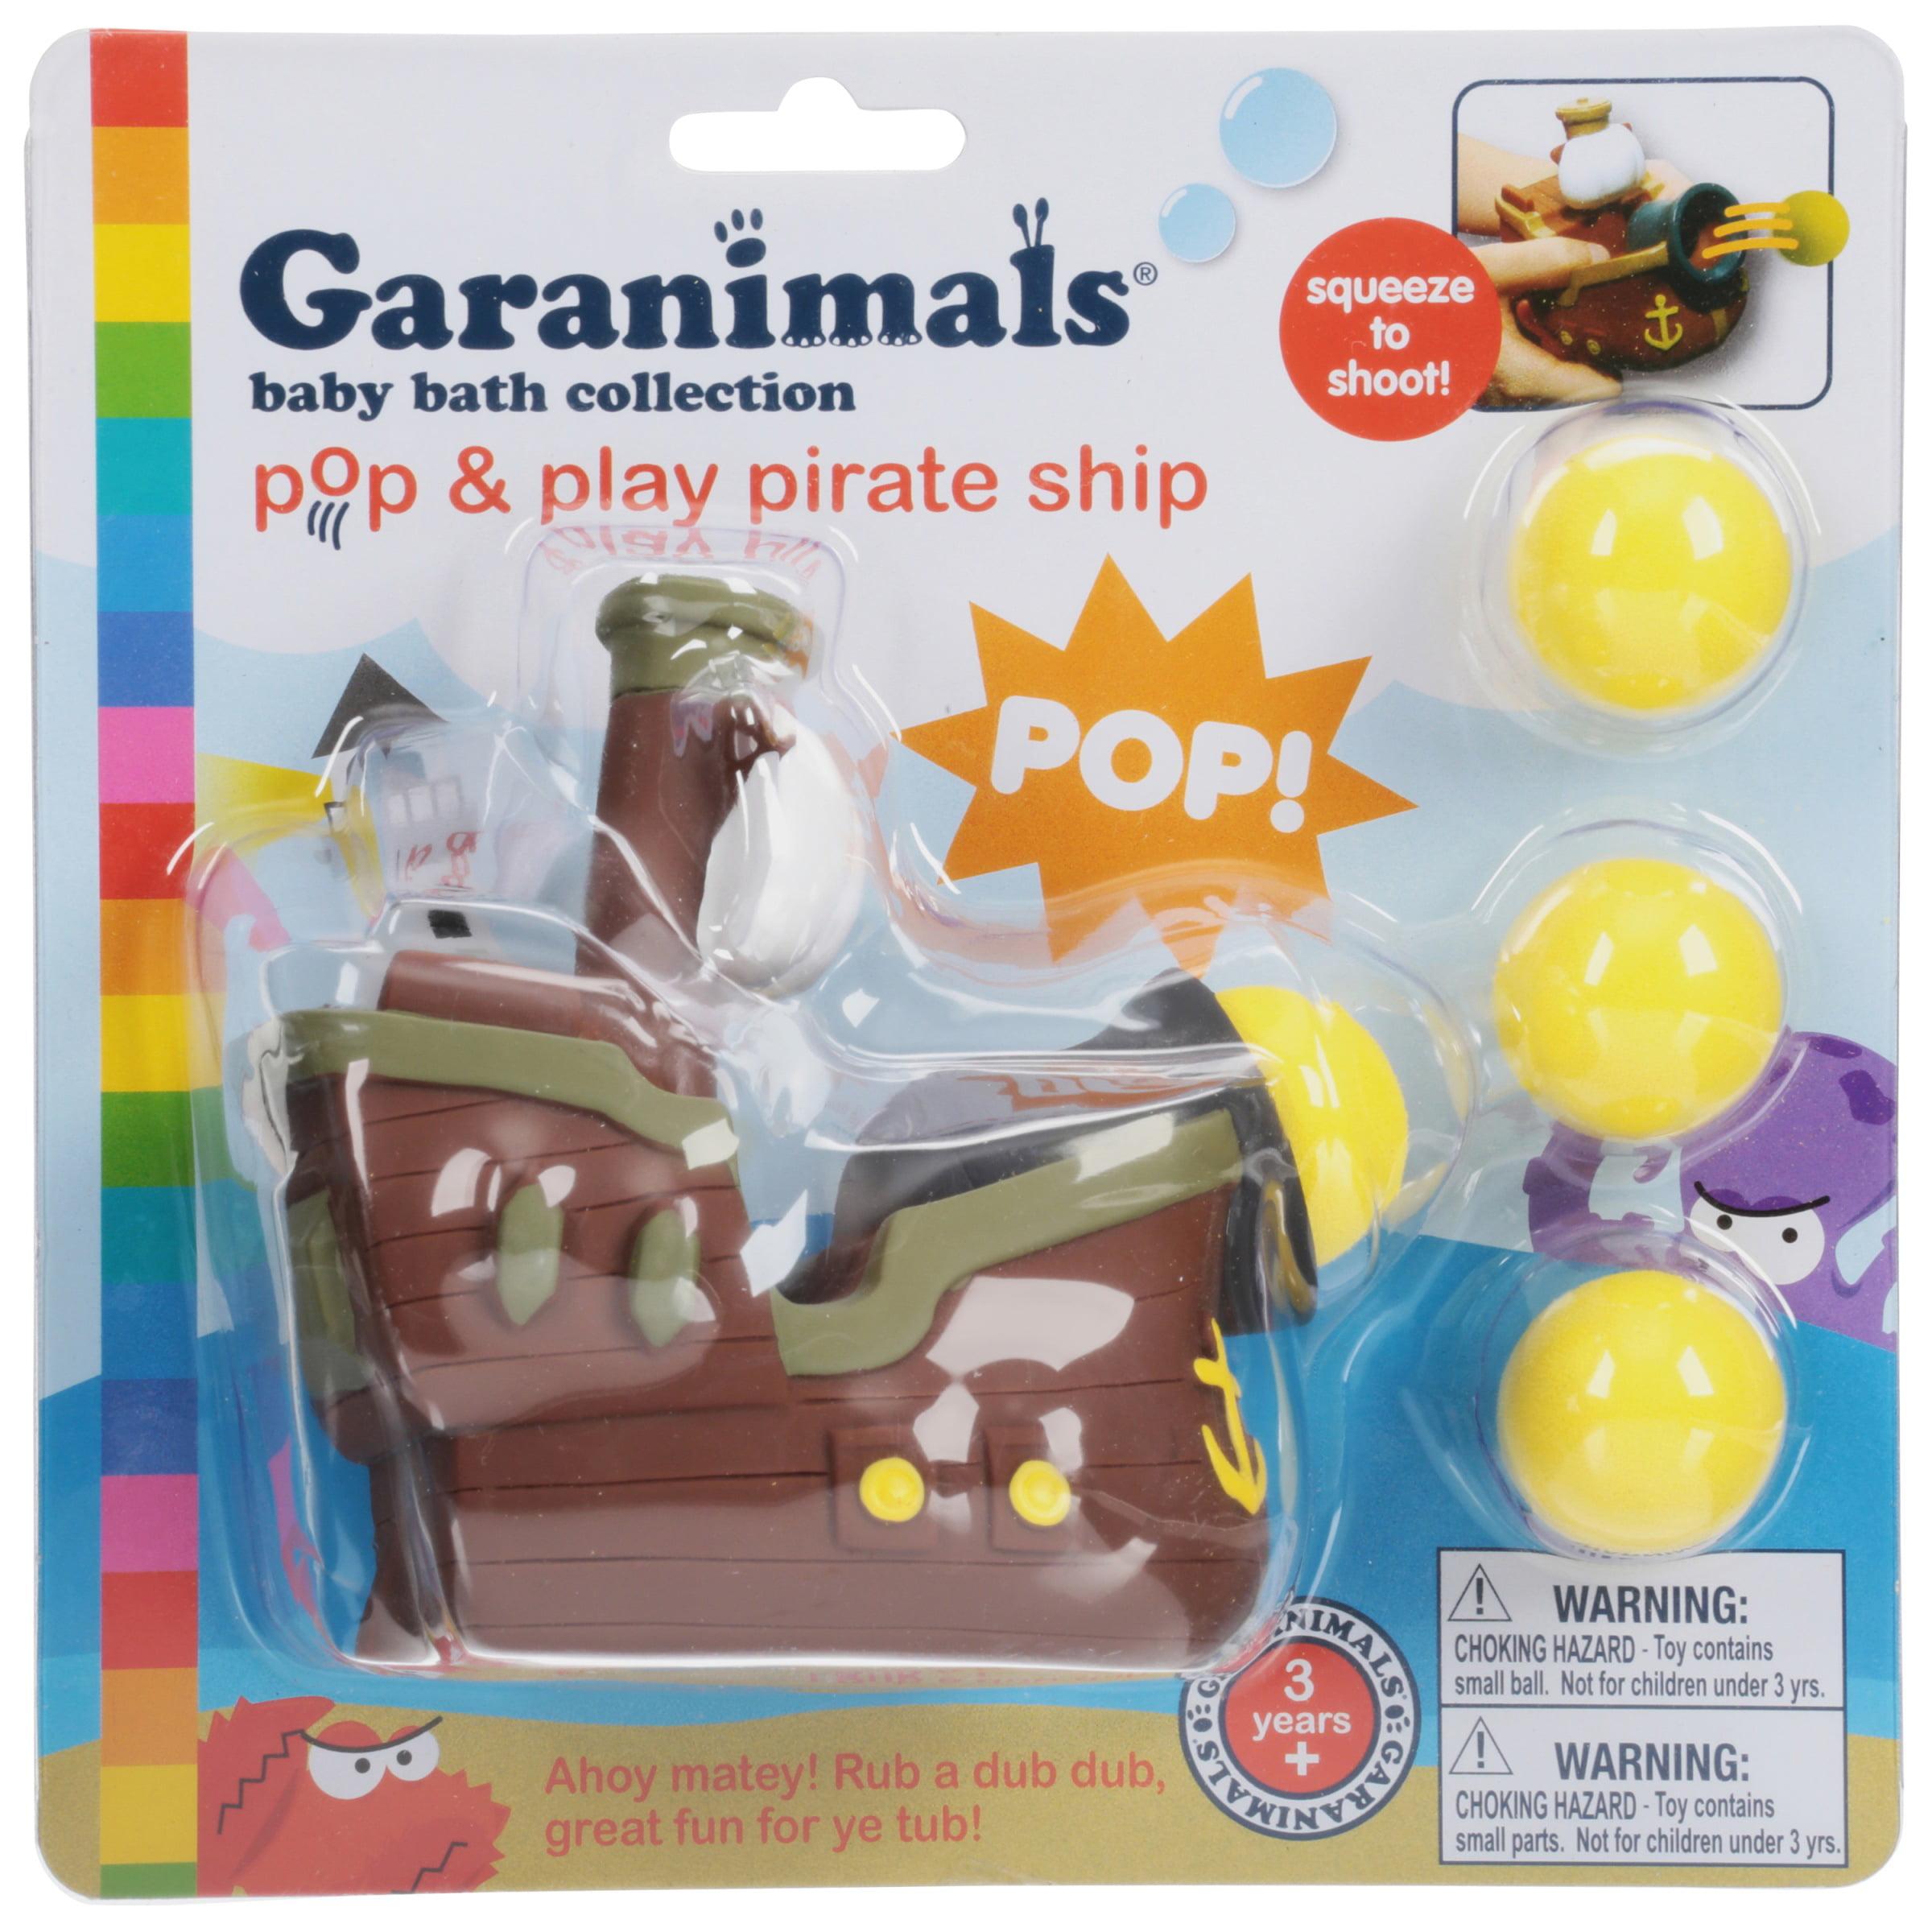 Garanimals®Baby Bath Collection Pop & Play Pirate Ship 5 pc Pack ...